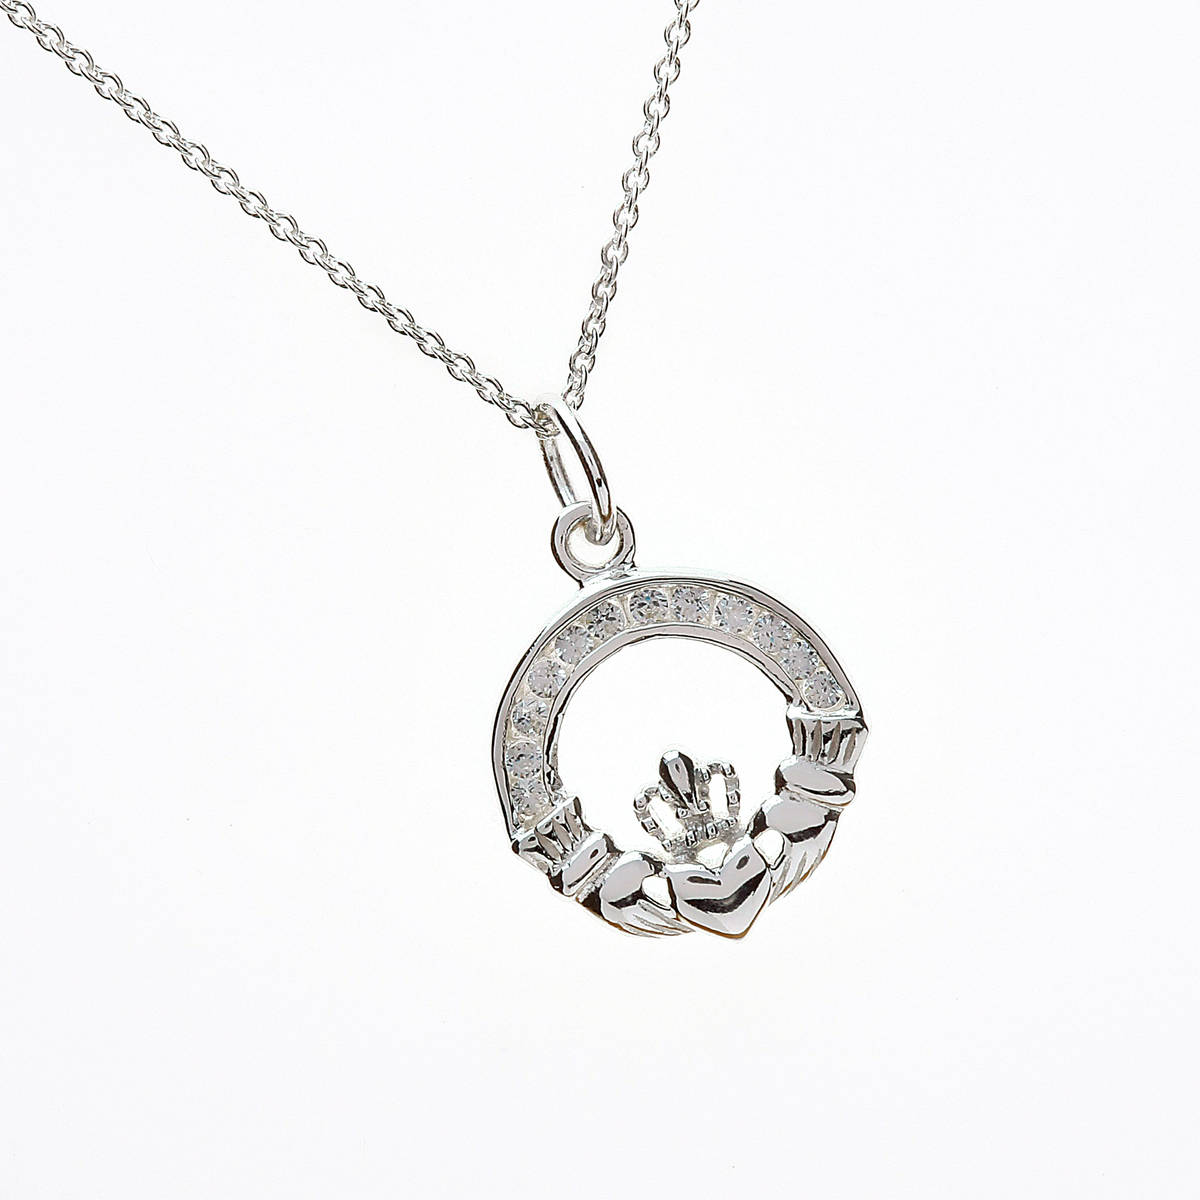 Silver Small Cz Claddagh Pendant